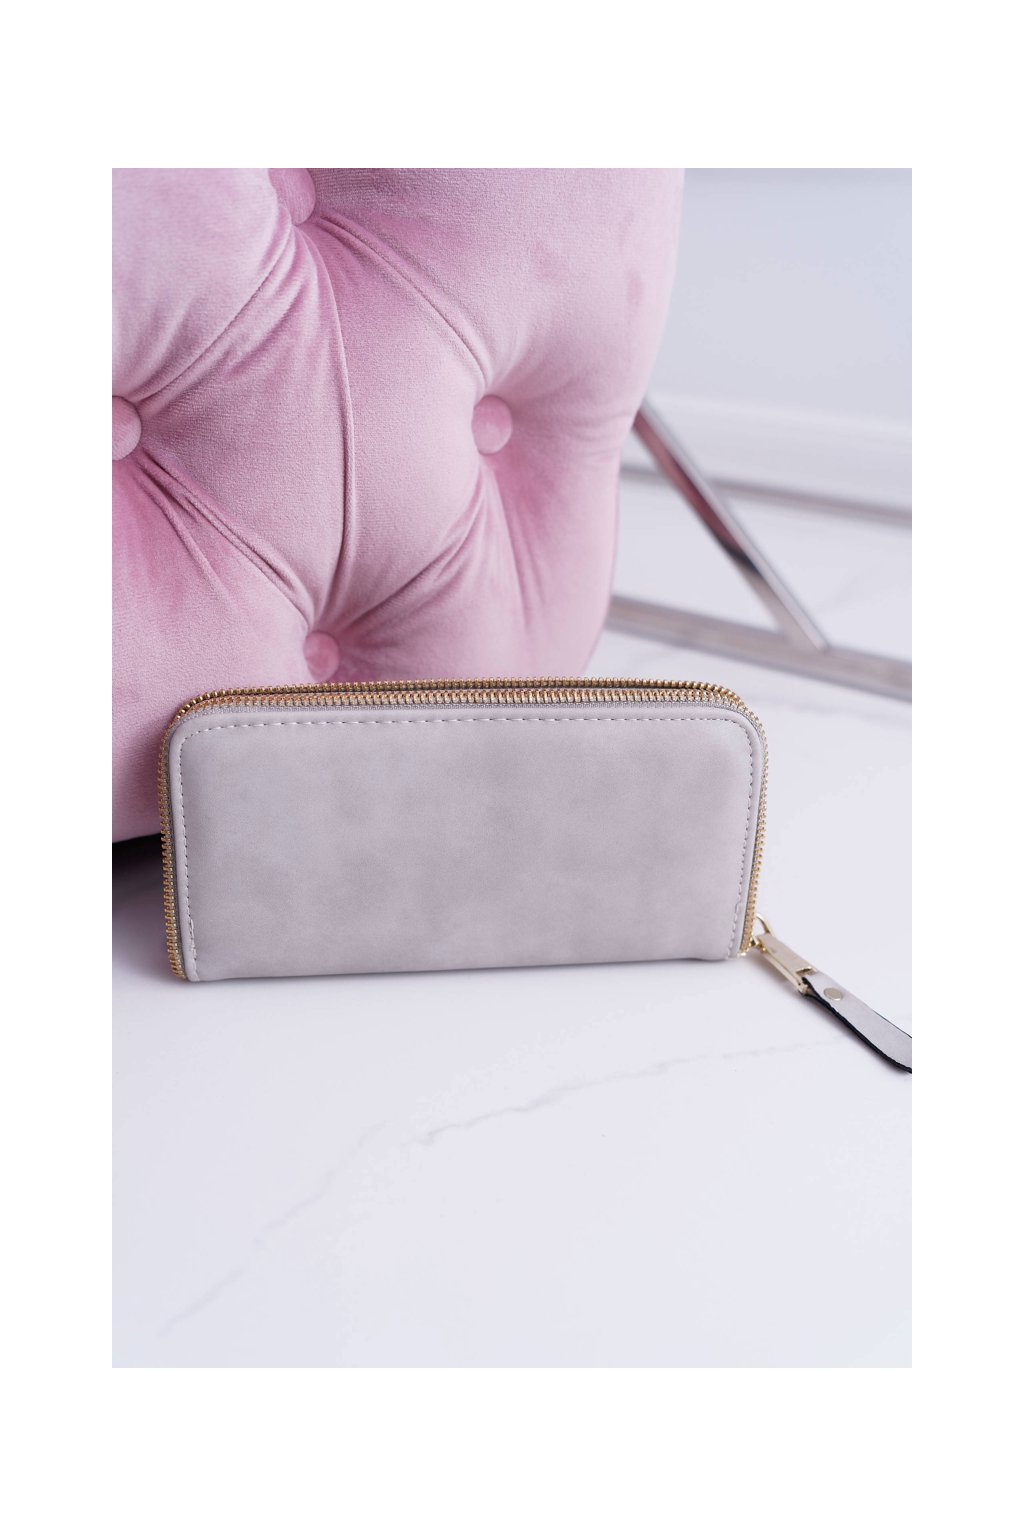 Peňaženka farba sivá kód AC-169 GREY